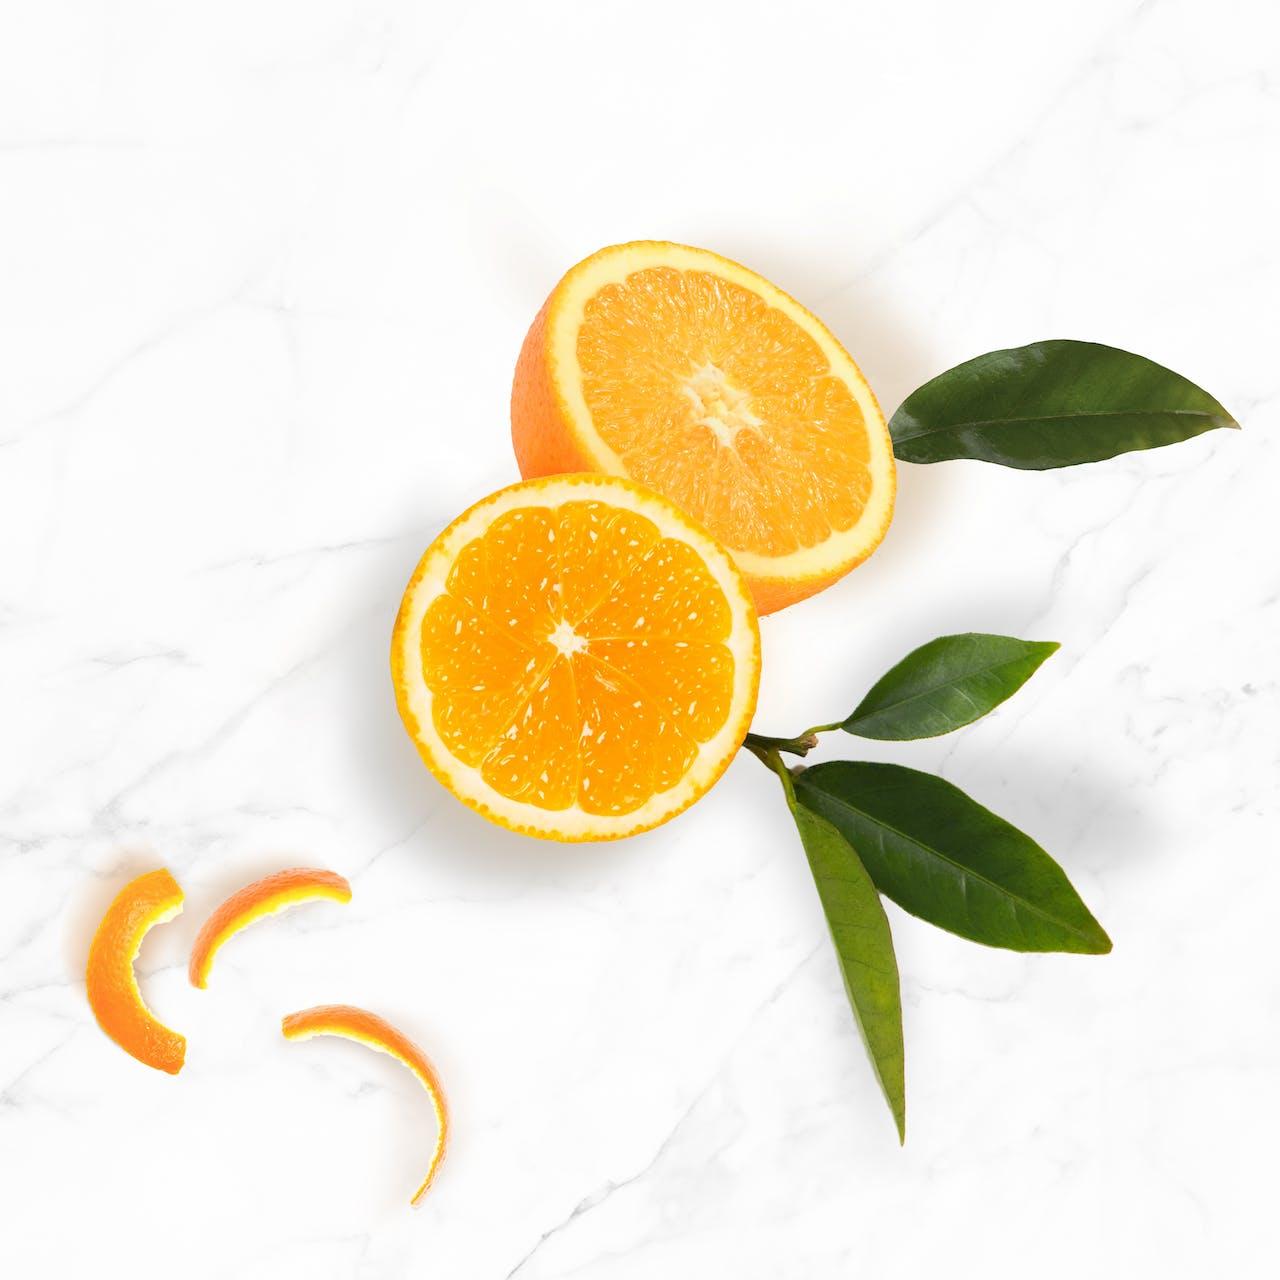 N.A.E. Inhaltsstoffe Bio-Mandarine